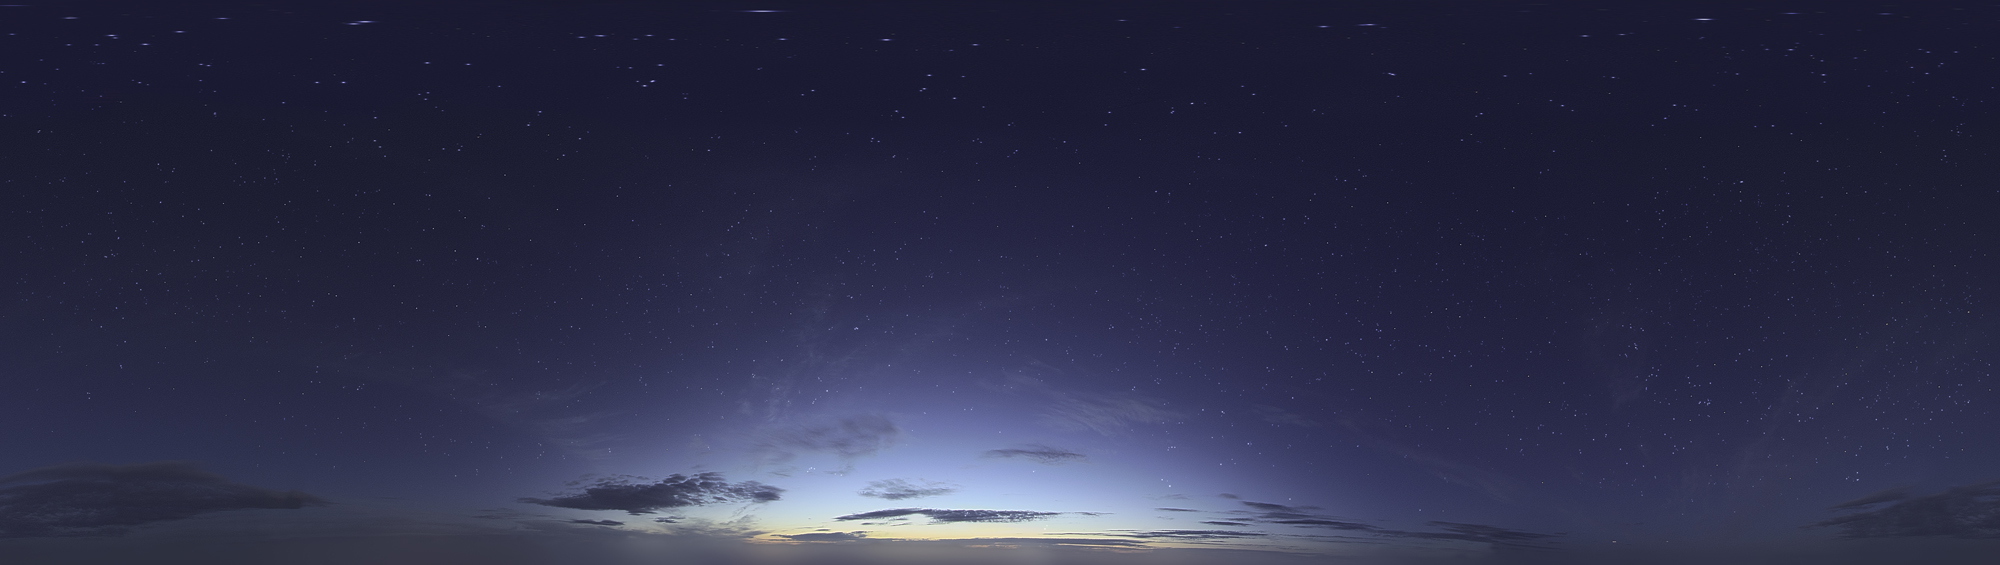 Skydome HDRI - Starlight Sky by Ardak